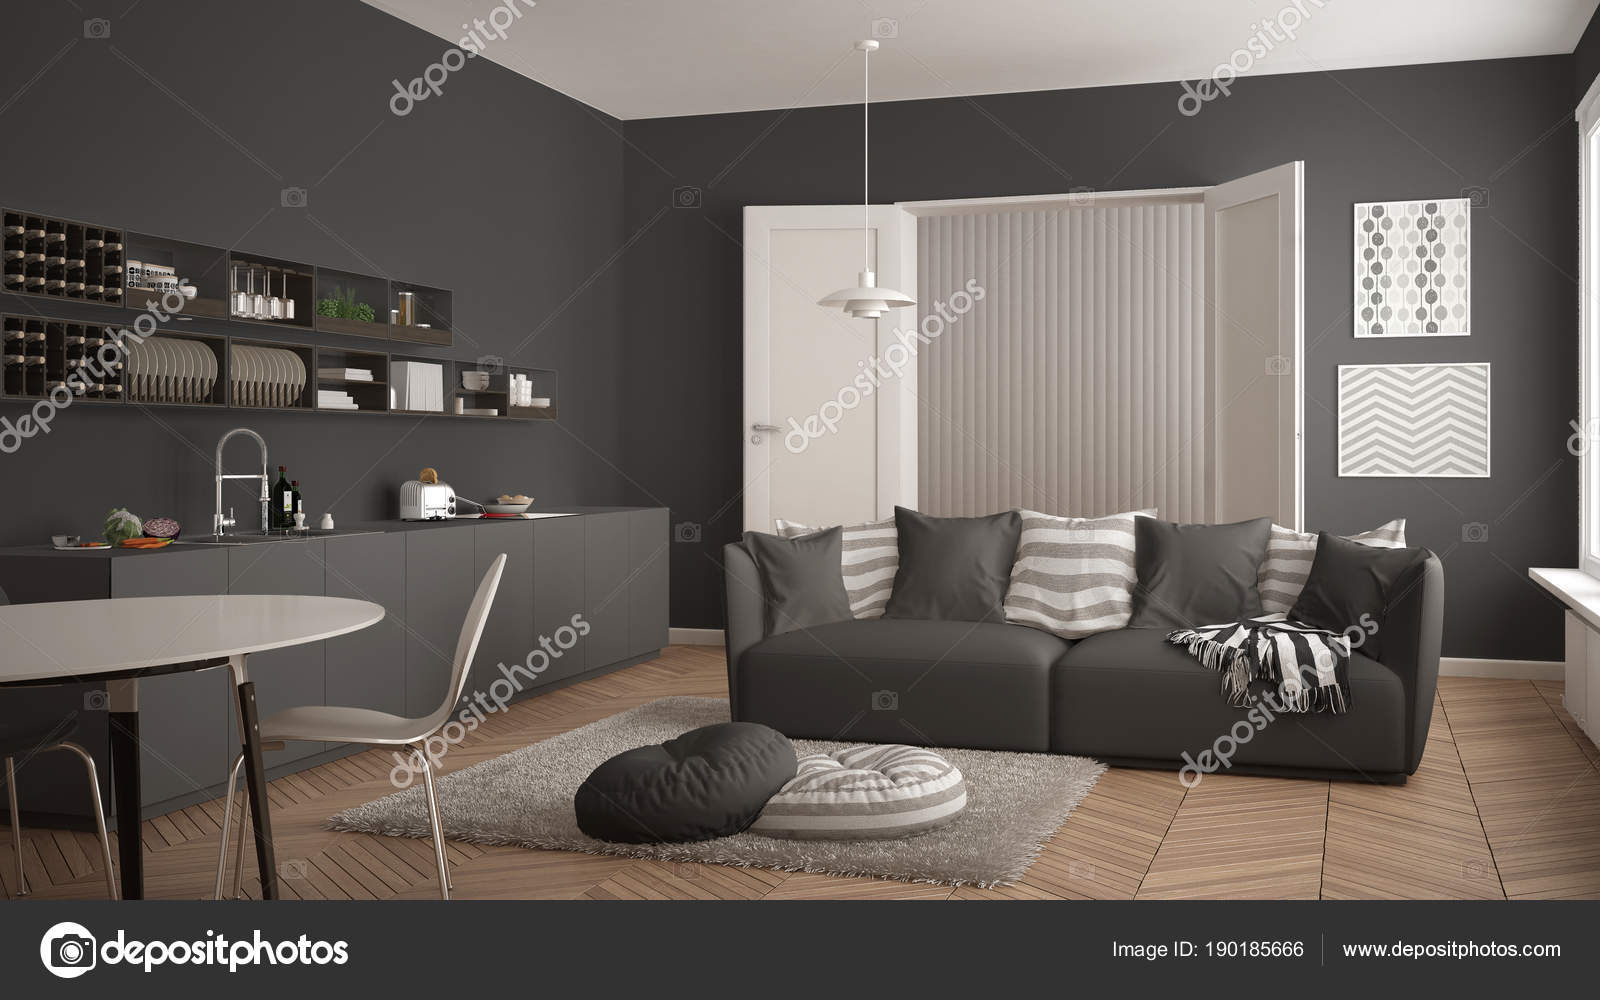 Scandinavo moderno salotto con cucina, tavolo da pranzo, divano e ...